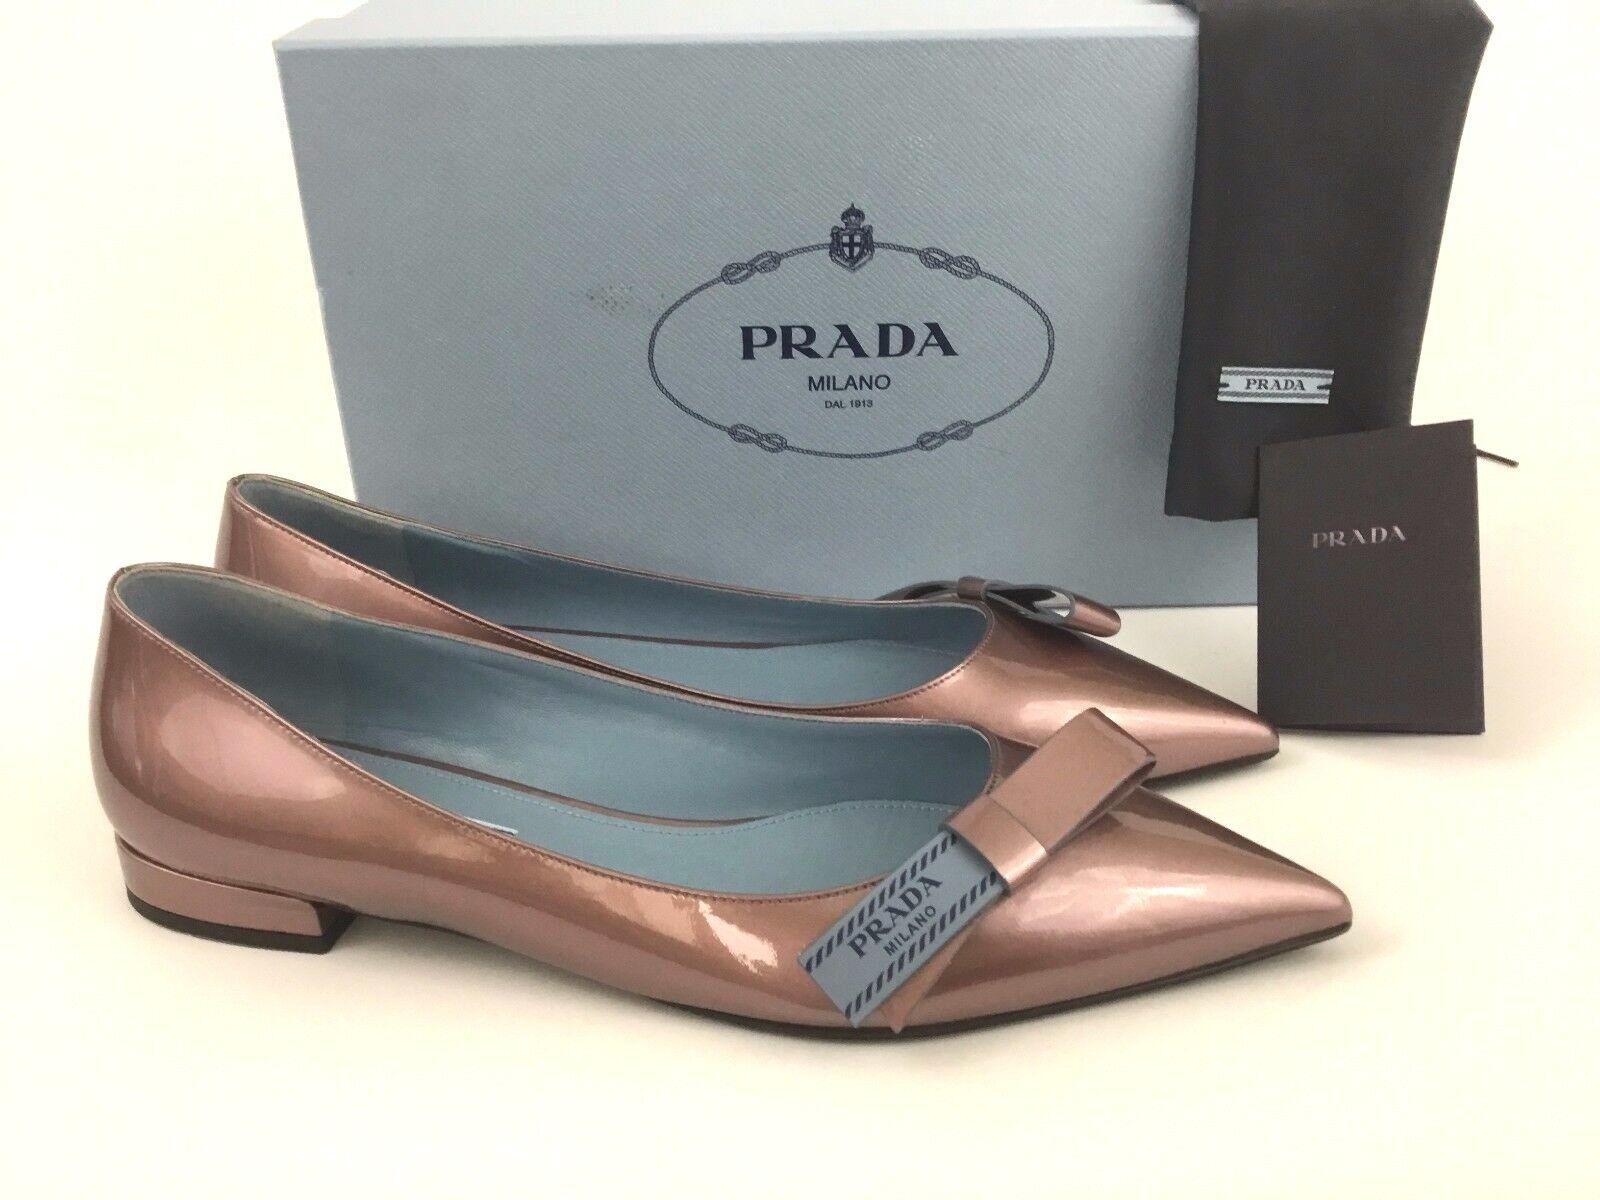 PRADA Logo Bow Pointy Toe Mauve Patent Leather Ballet Ballet Ballet Flat 39 9 8387ba